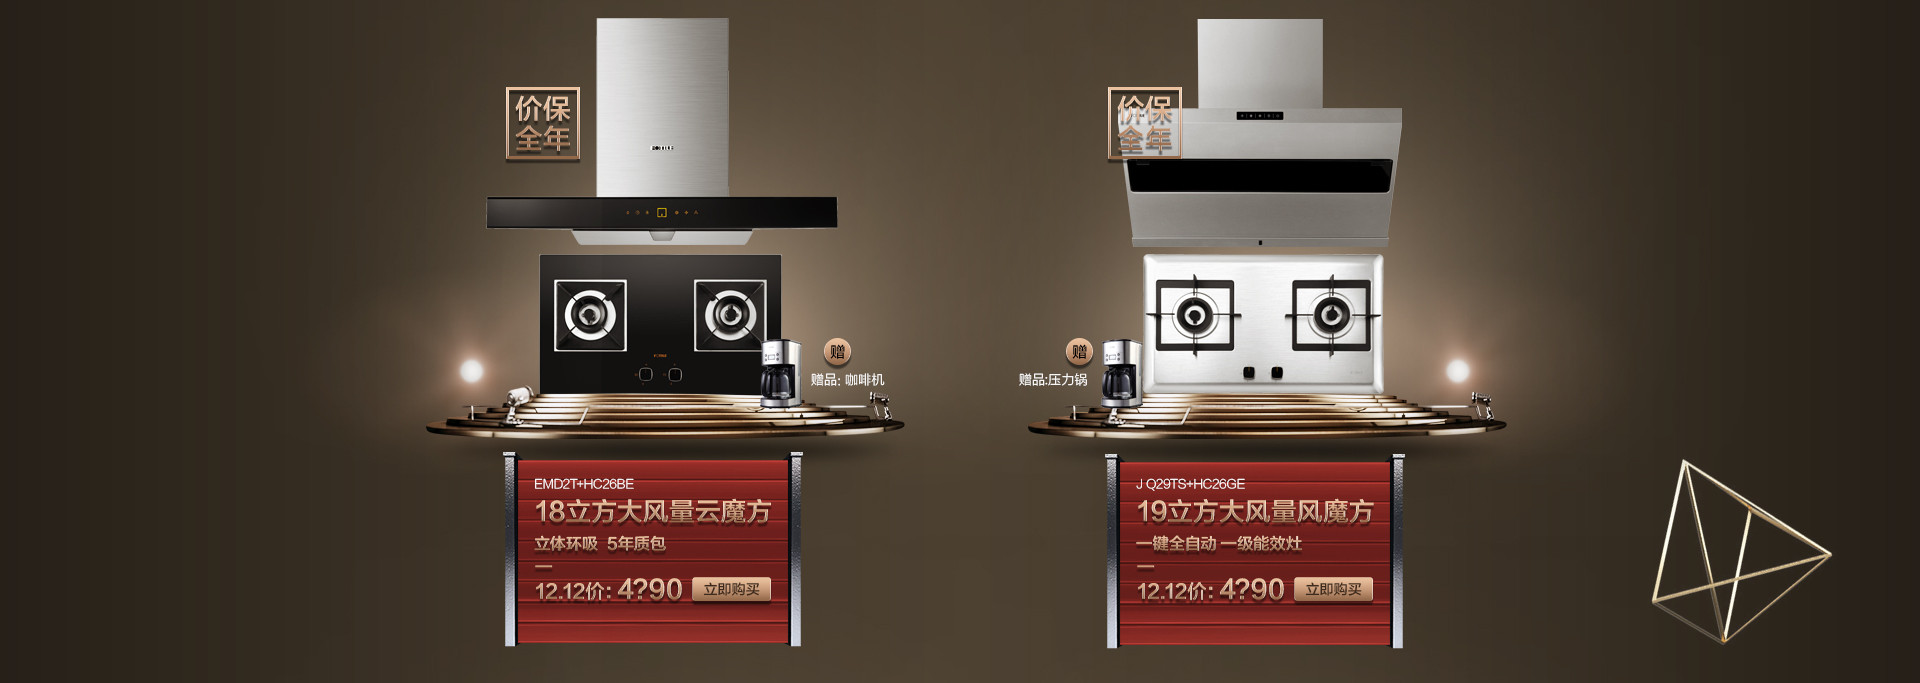 http://image.suning.cn/uimg/sop/commodity/209025511171321969029790_x.jpg